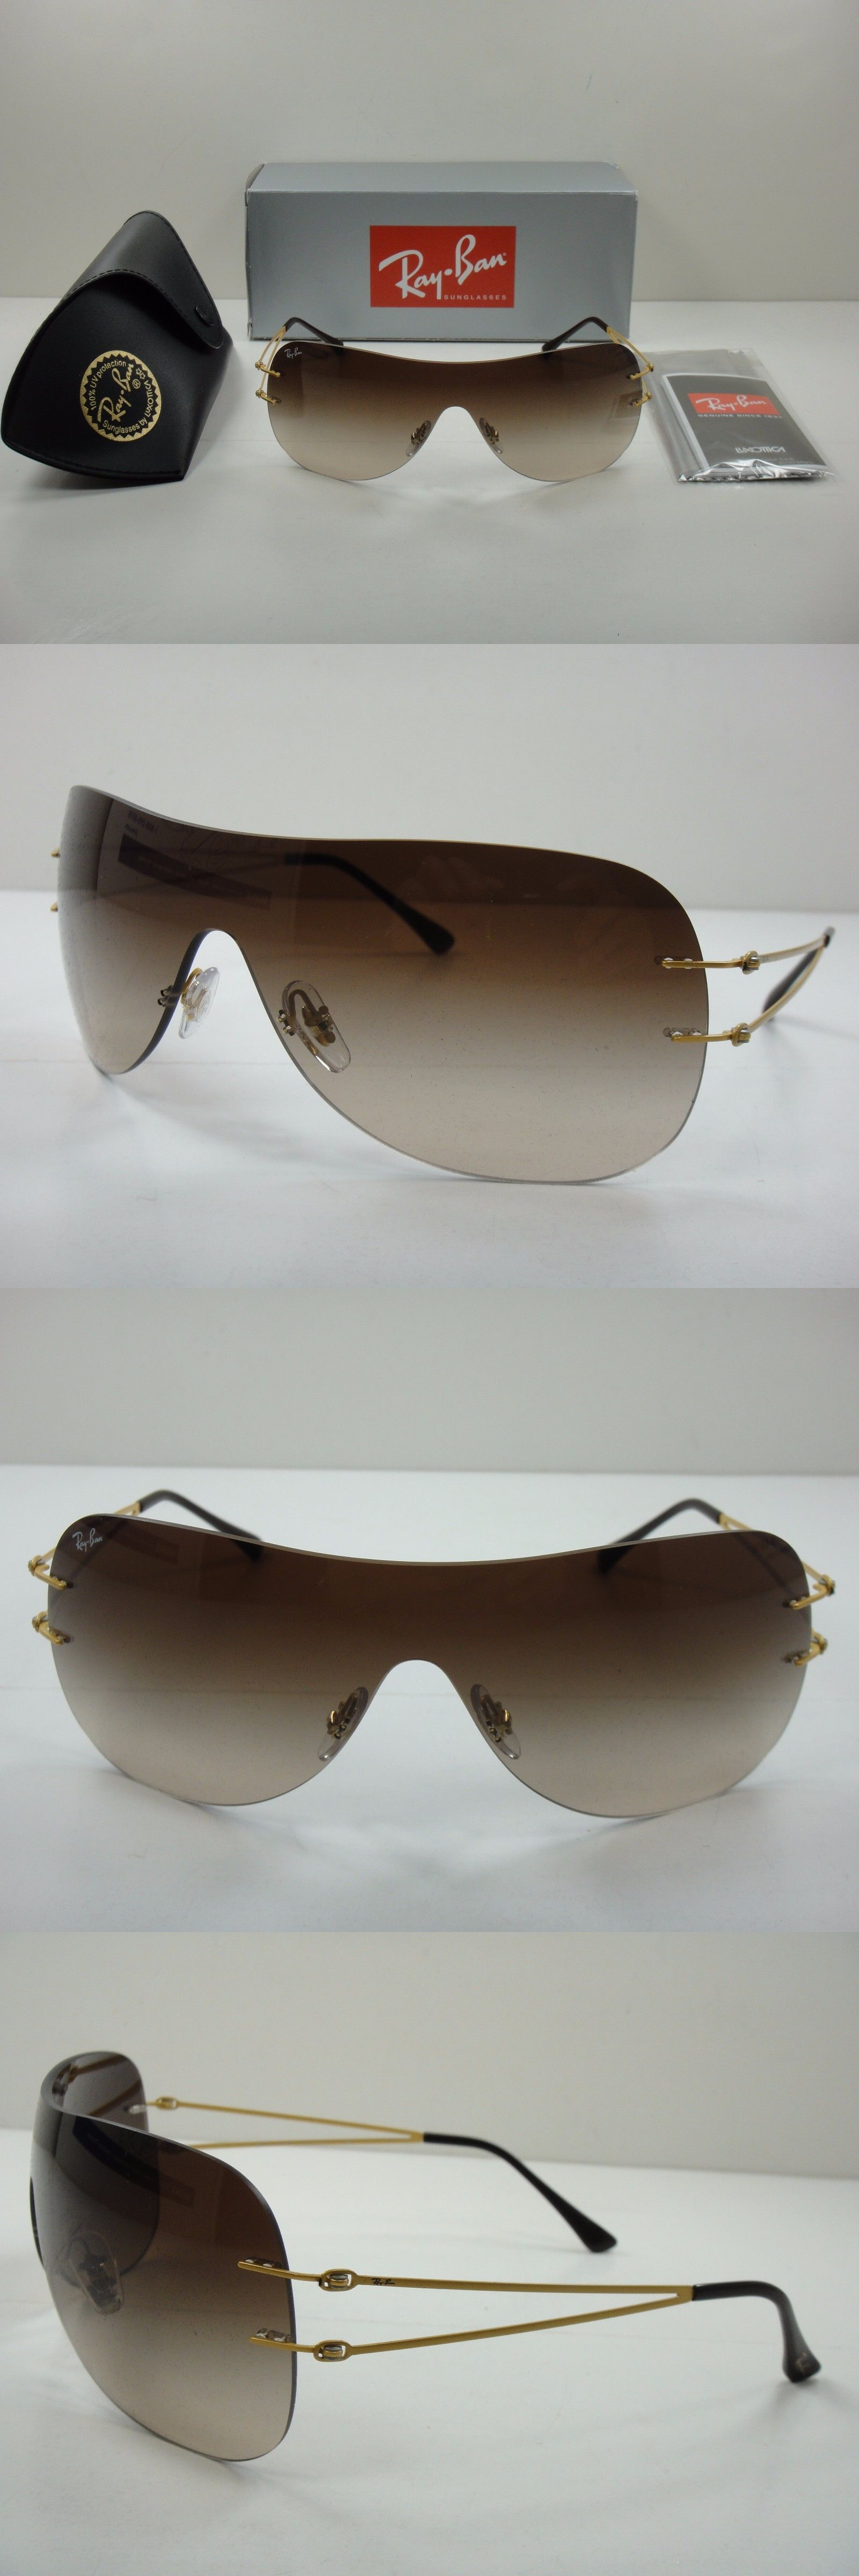 Sunglasses 45246: Ray-Ban Women Sunglasses Rb8057 157 13 Gold Frame ...